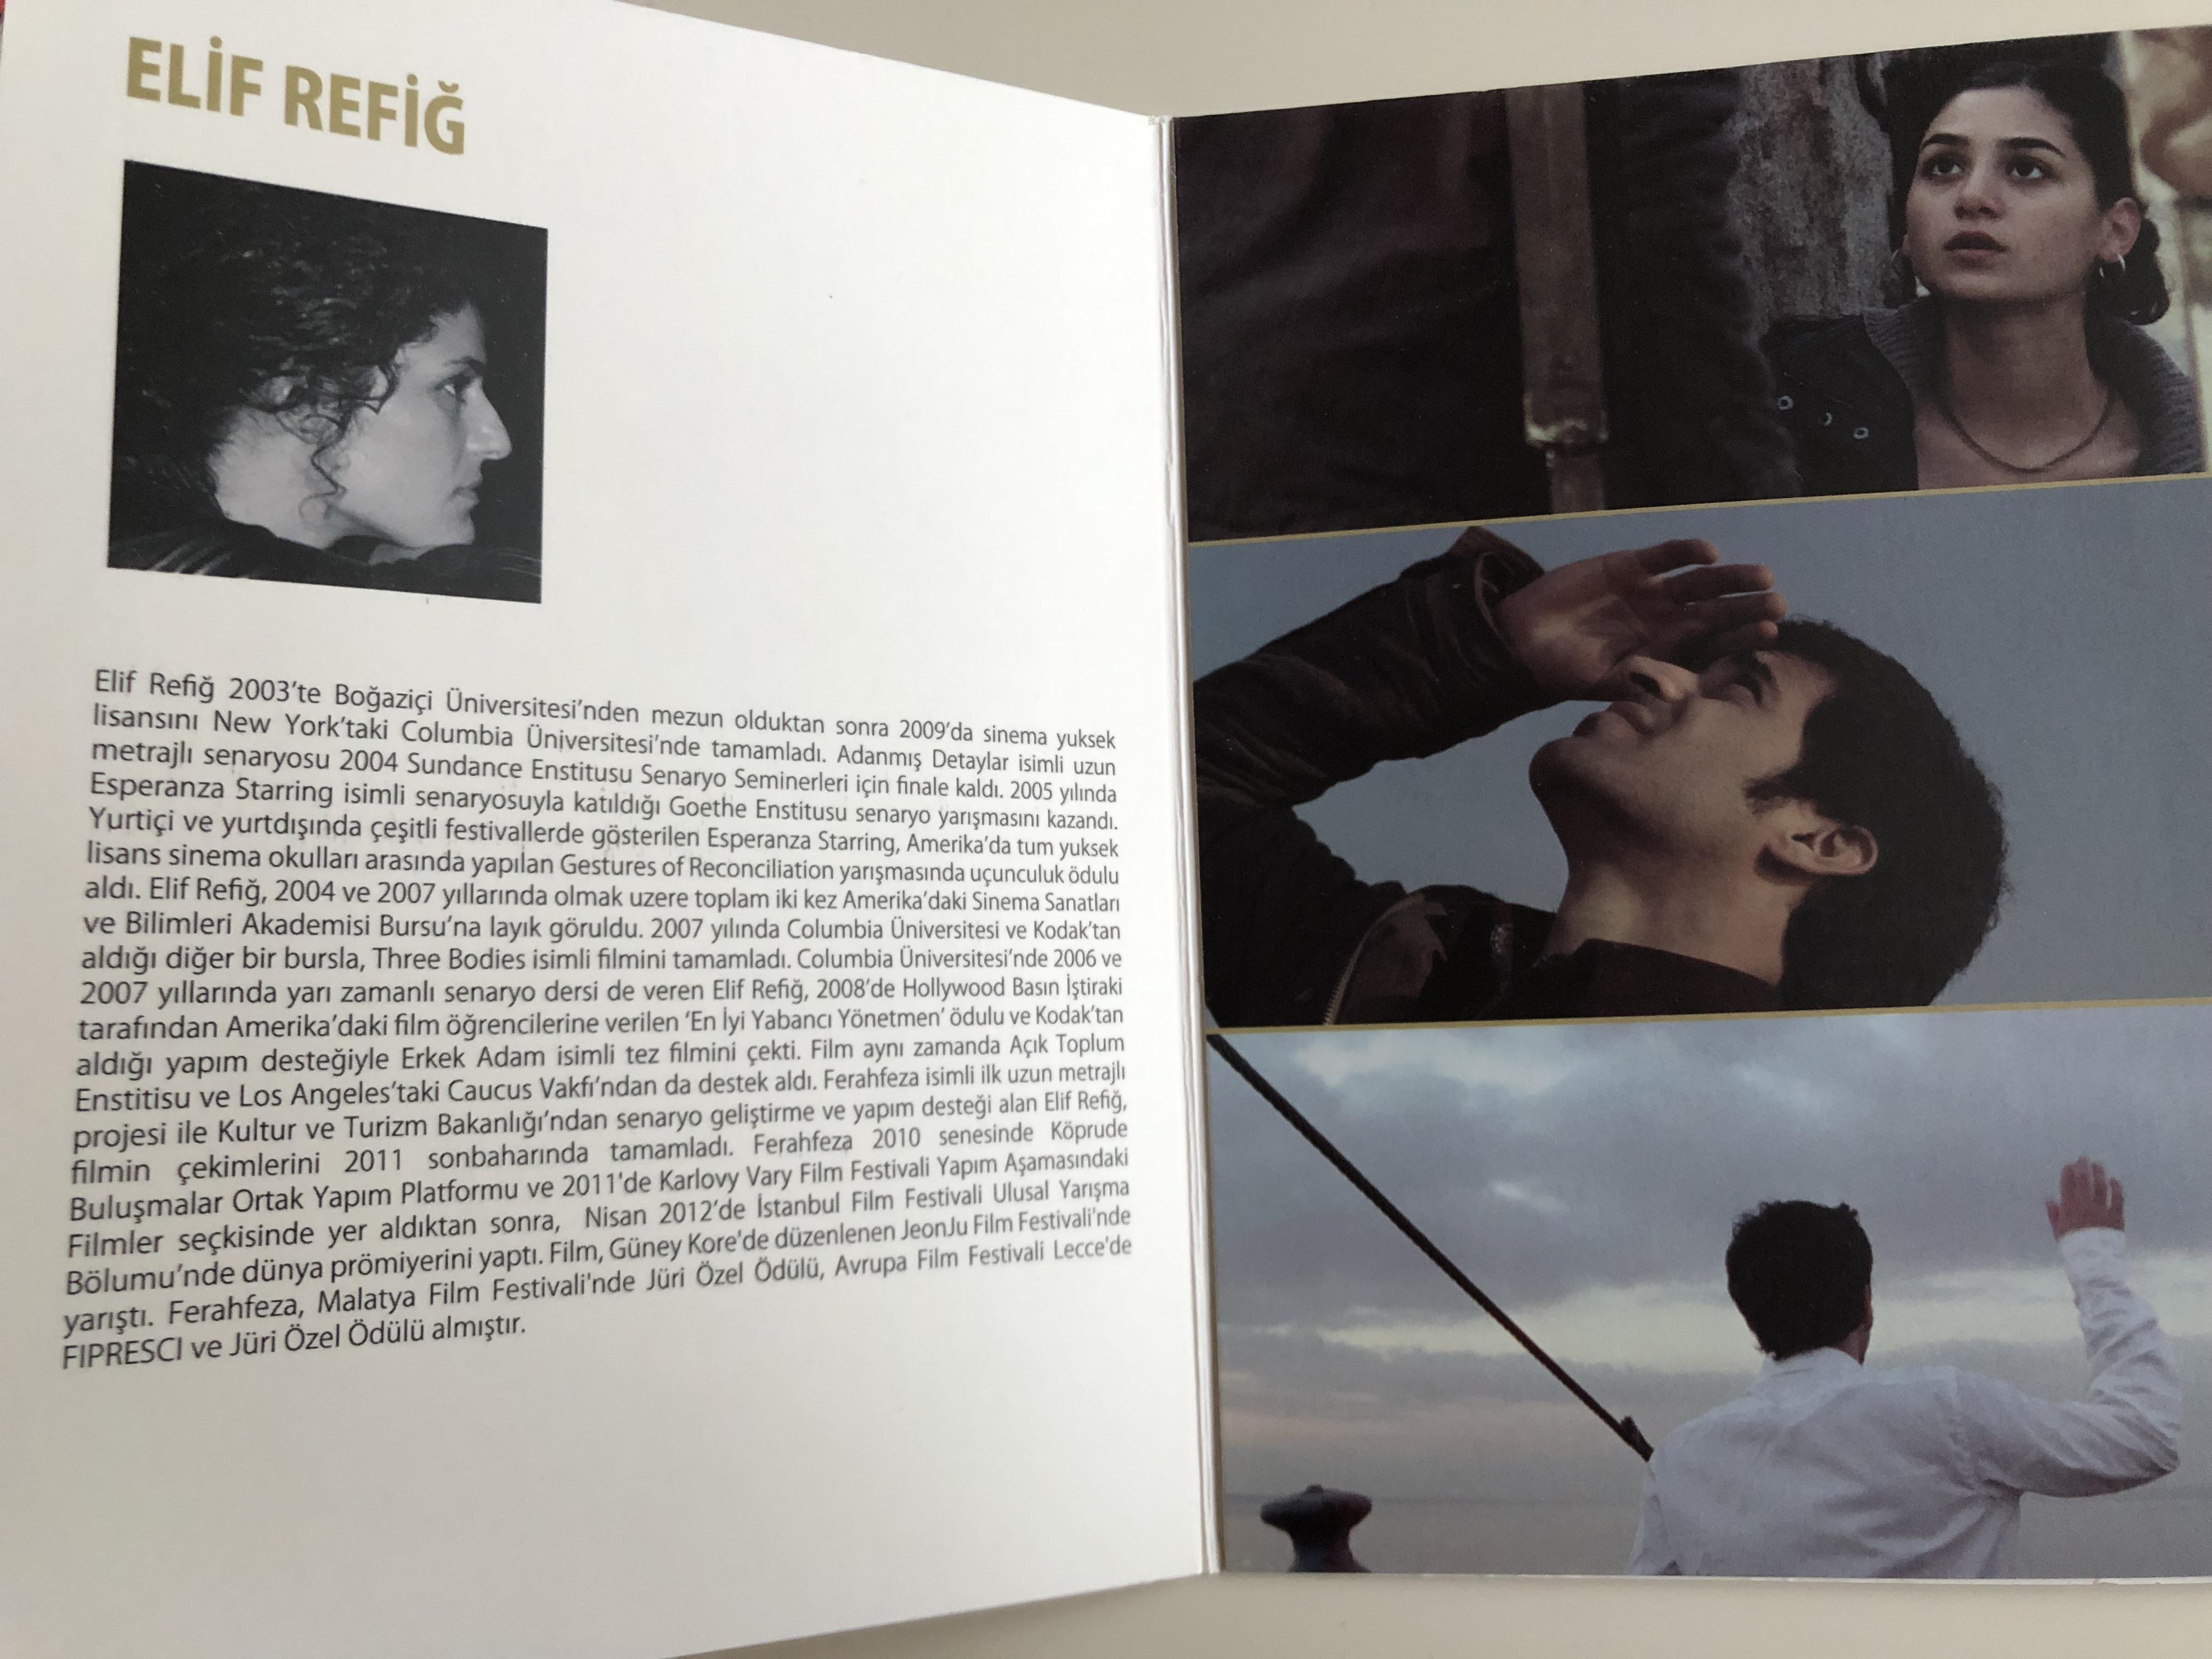 ferahfeza-dvd-2014-ships-directed-by-elif-refi-starring-mert-asutay-u-ur-uzunel-4-.jpg